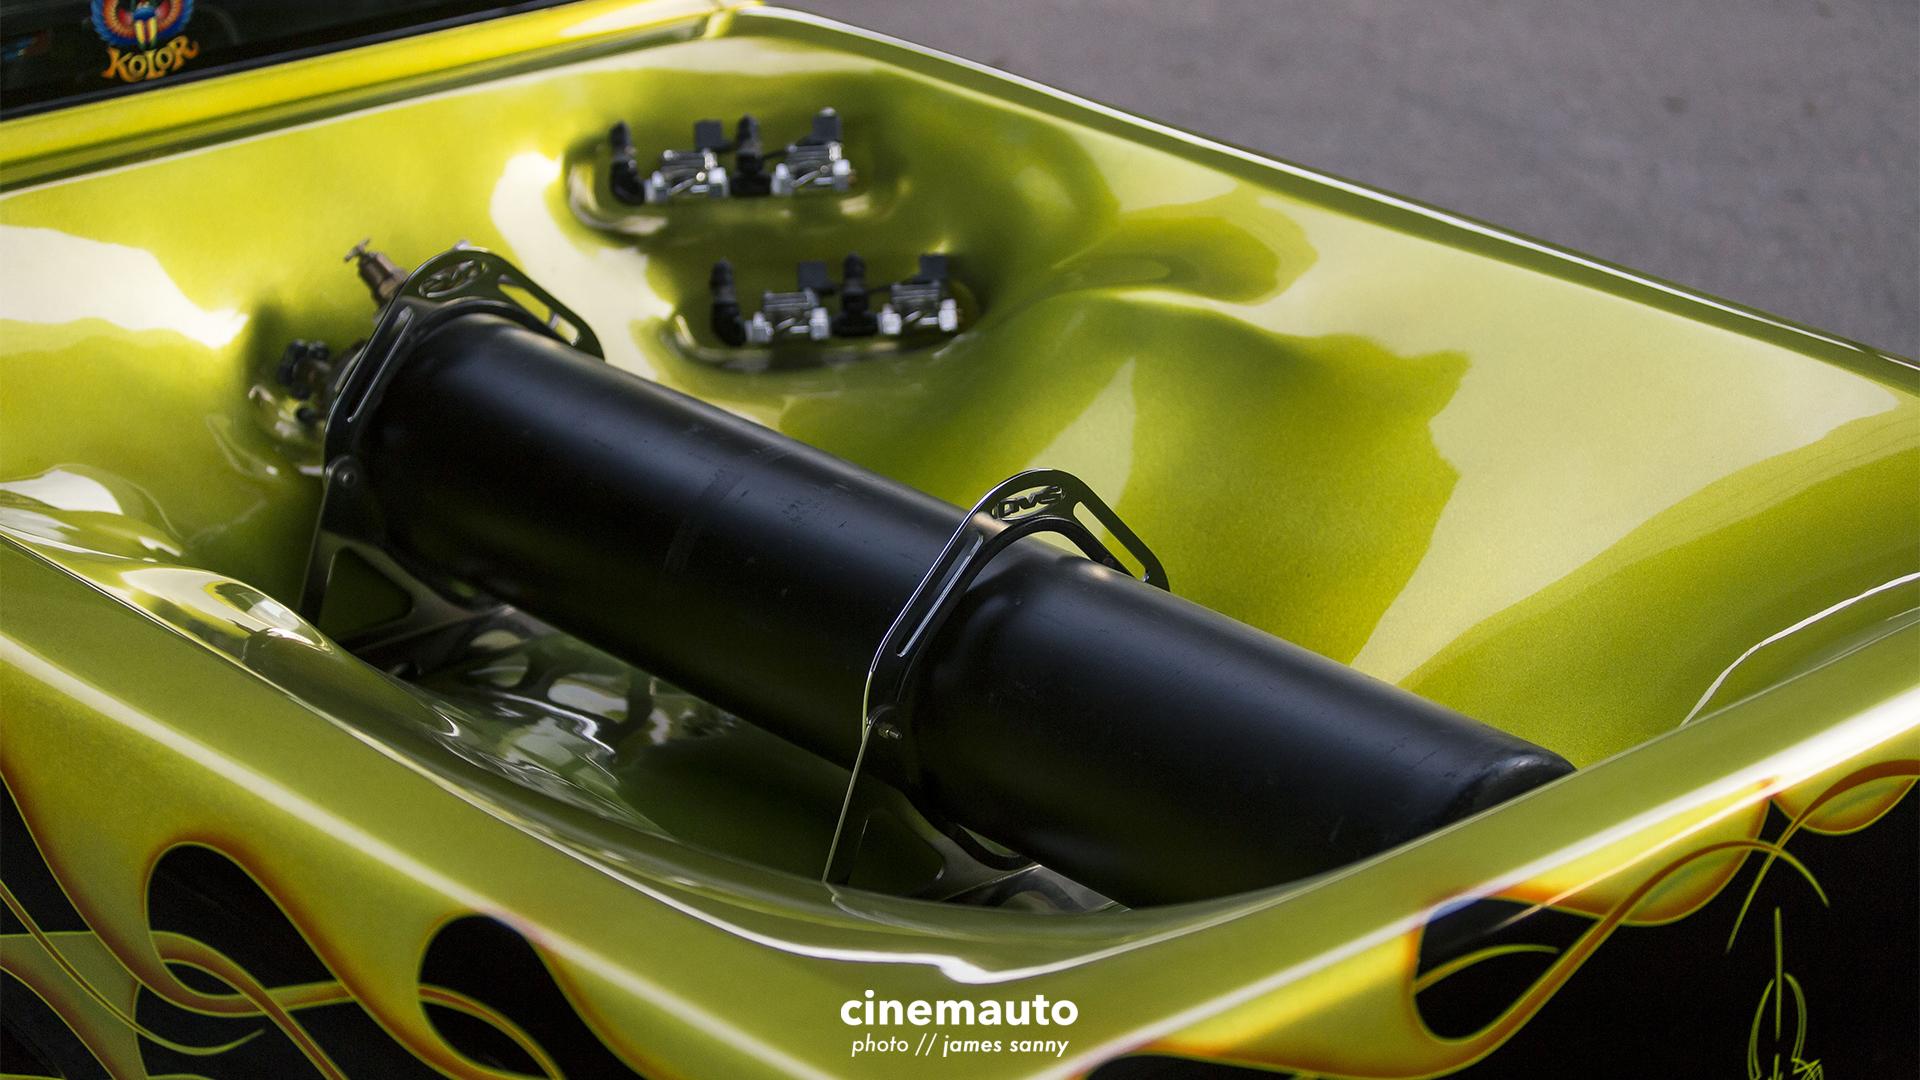 cinemauto-wichita-automotive-photographer-james-sanny-Osm.jpg